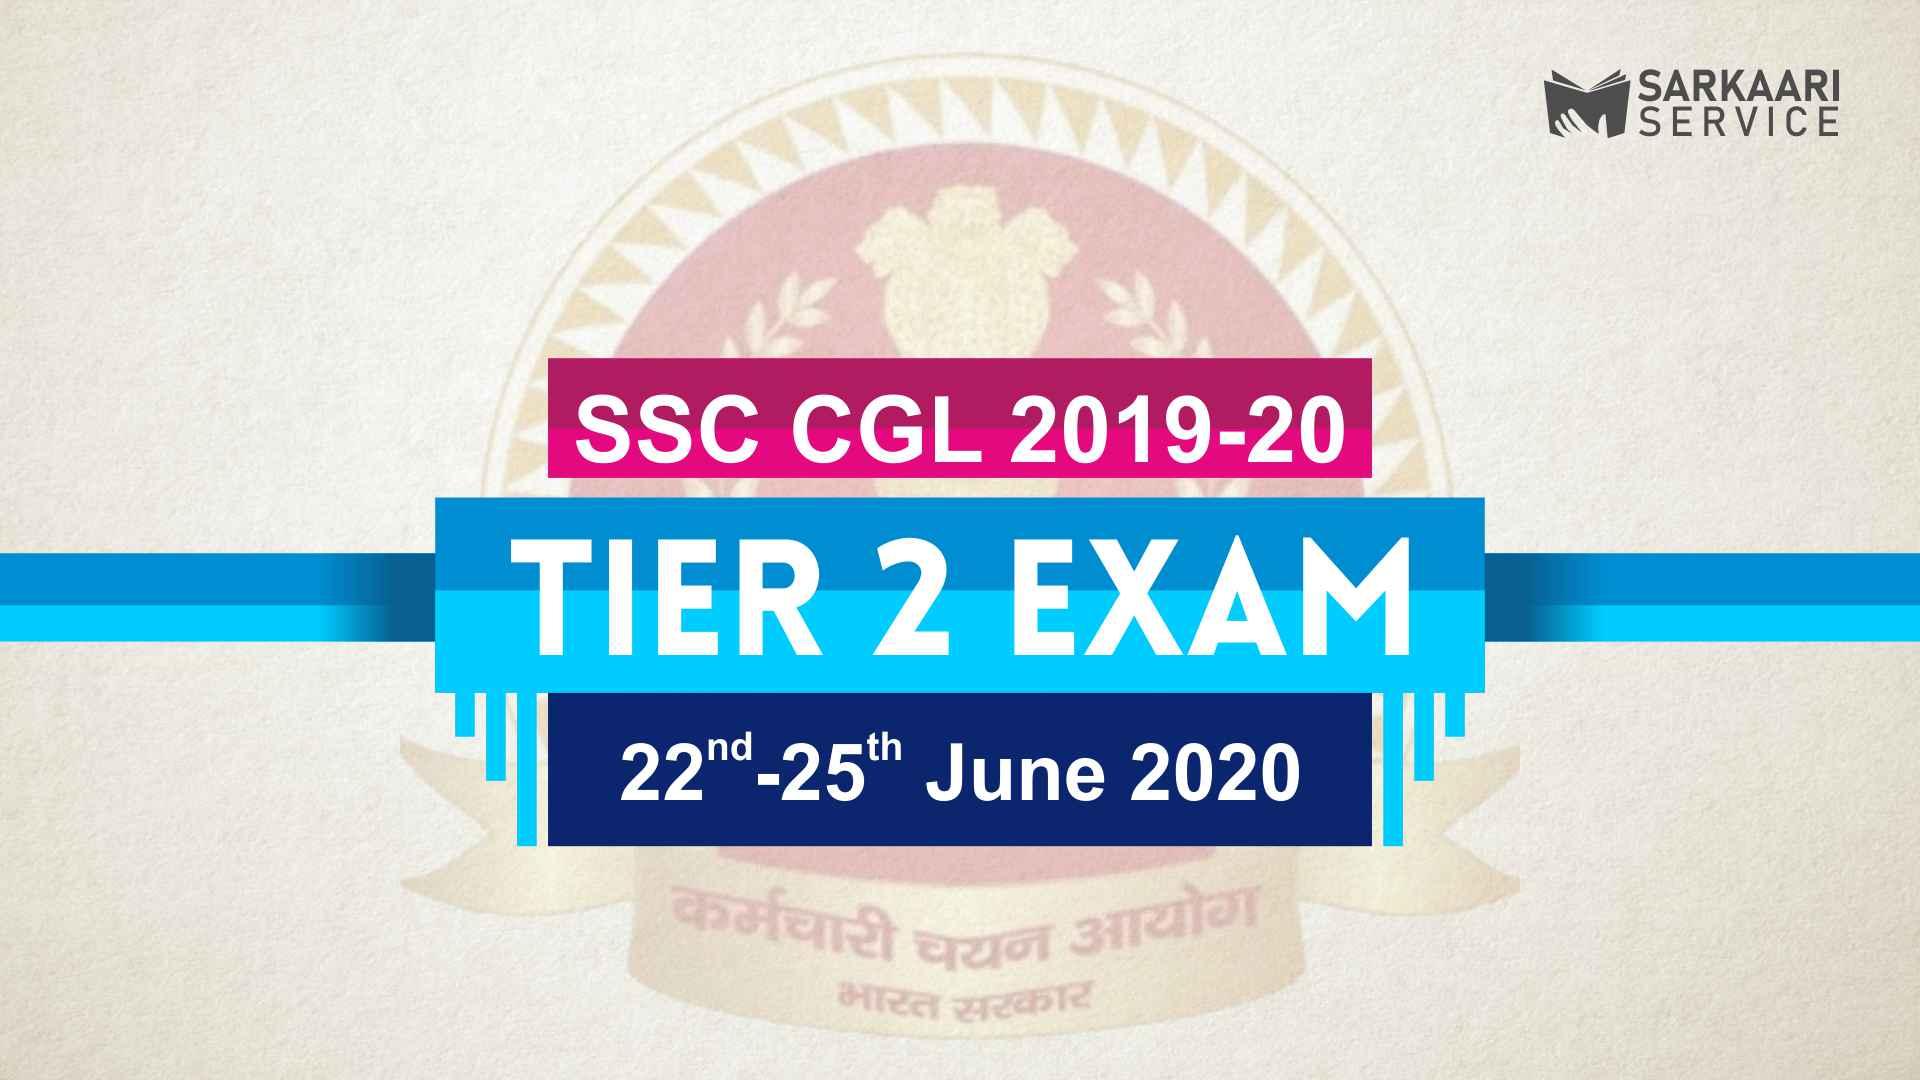 SSC CGL Tier 2 Exam Date 2019